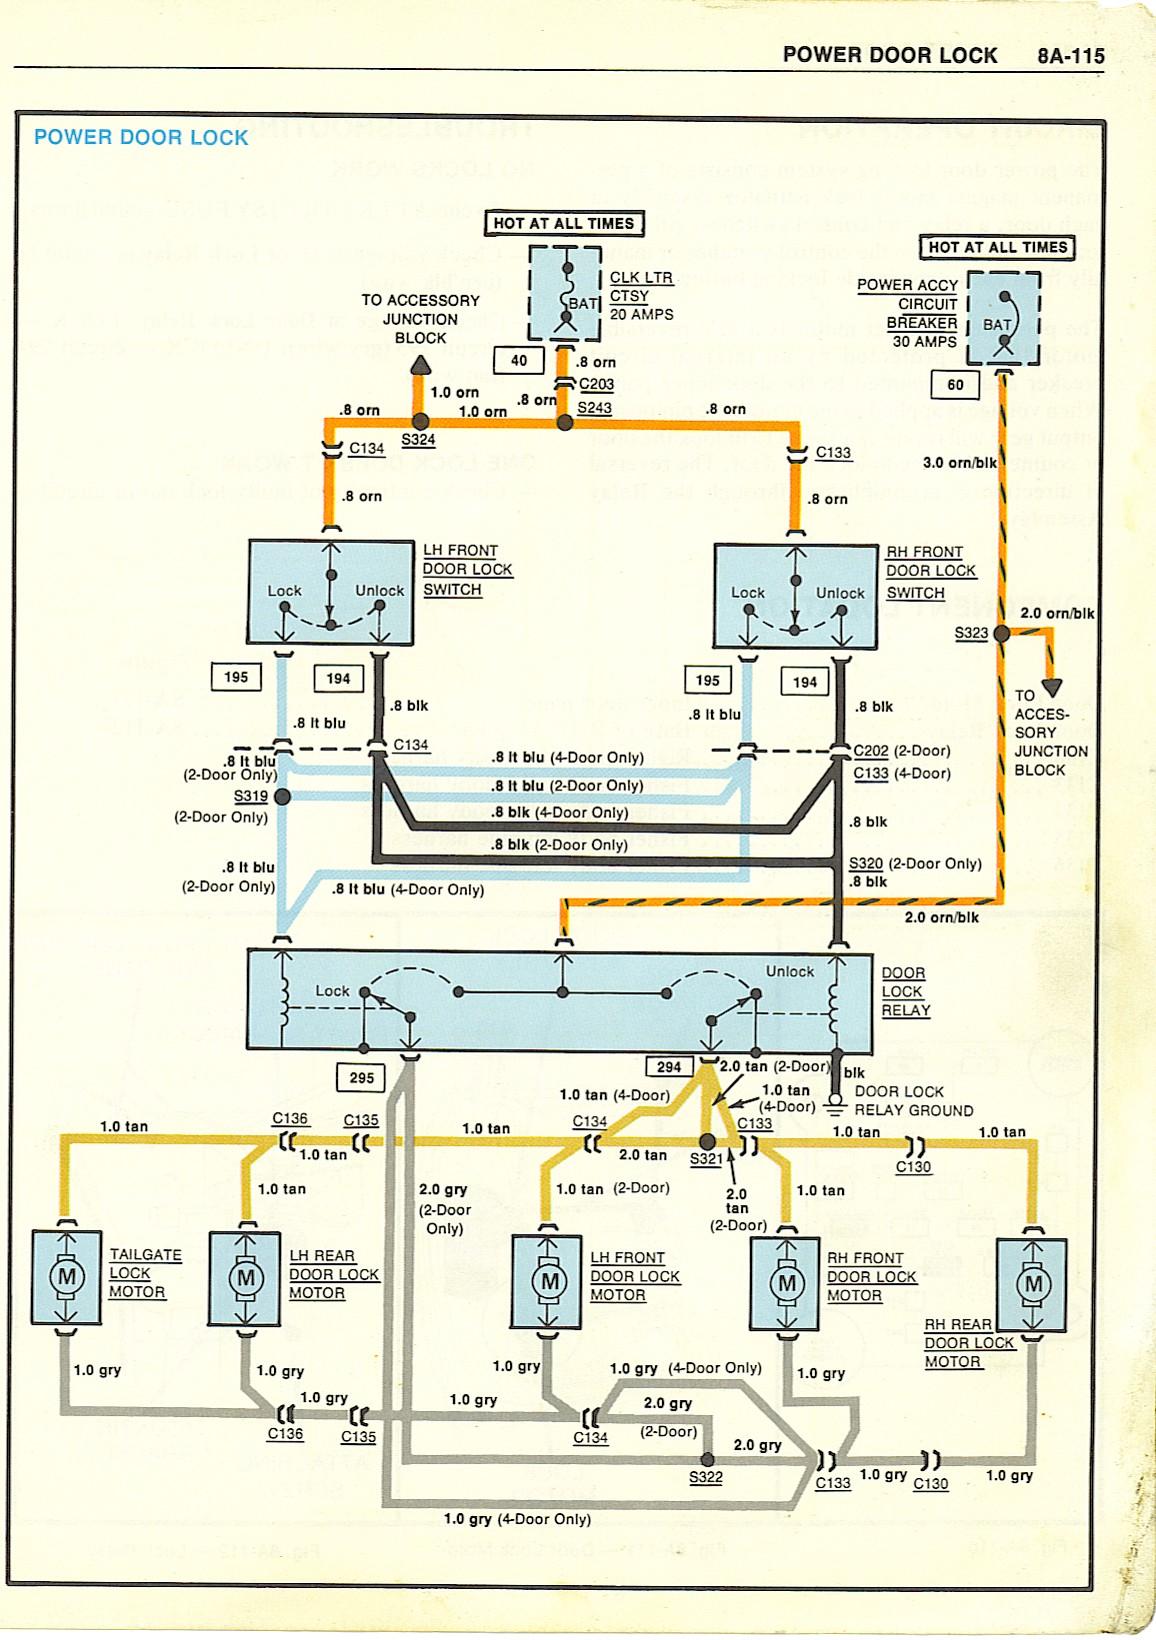 Gm Door Lock Switch Wiring Diagram   Wiring Diagram - Power Door Lock Wiring Diagram